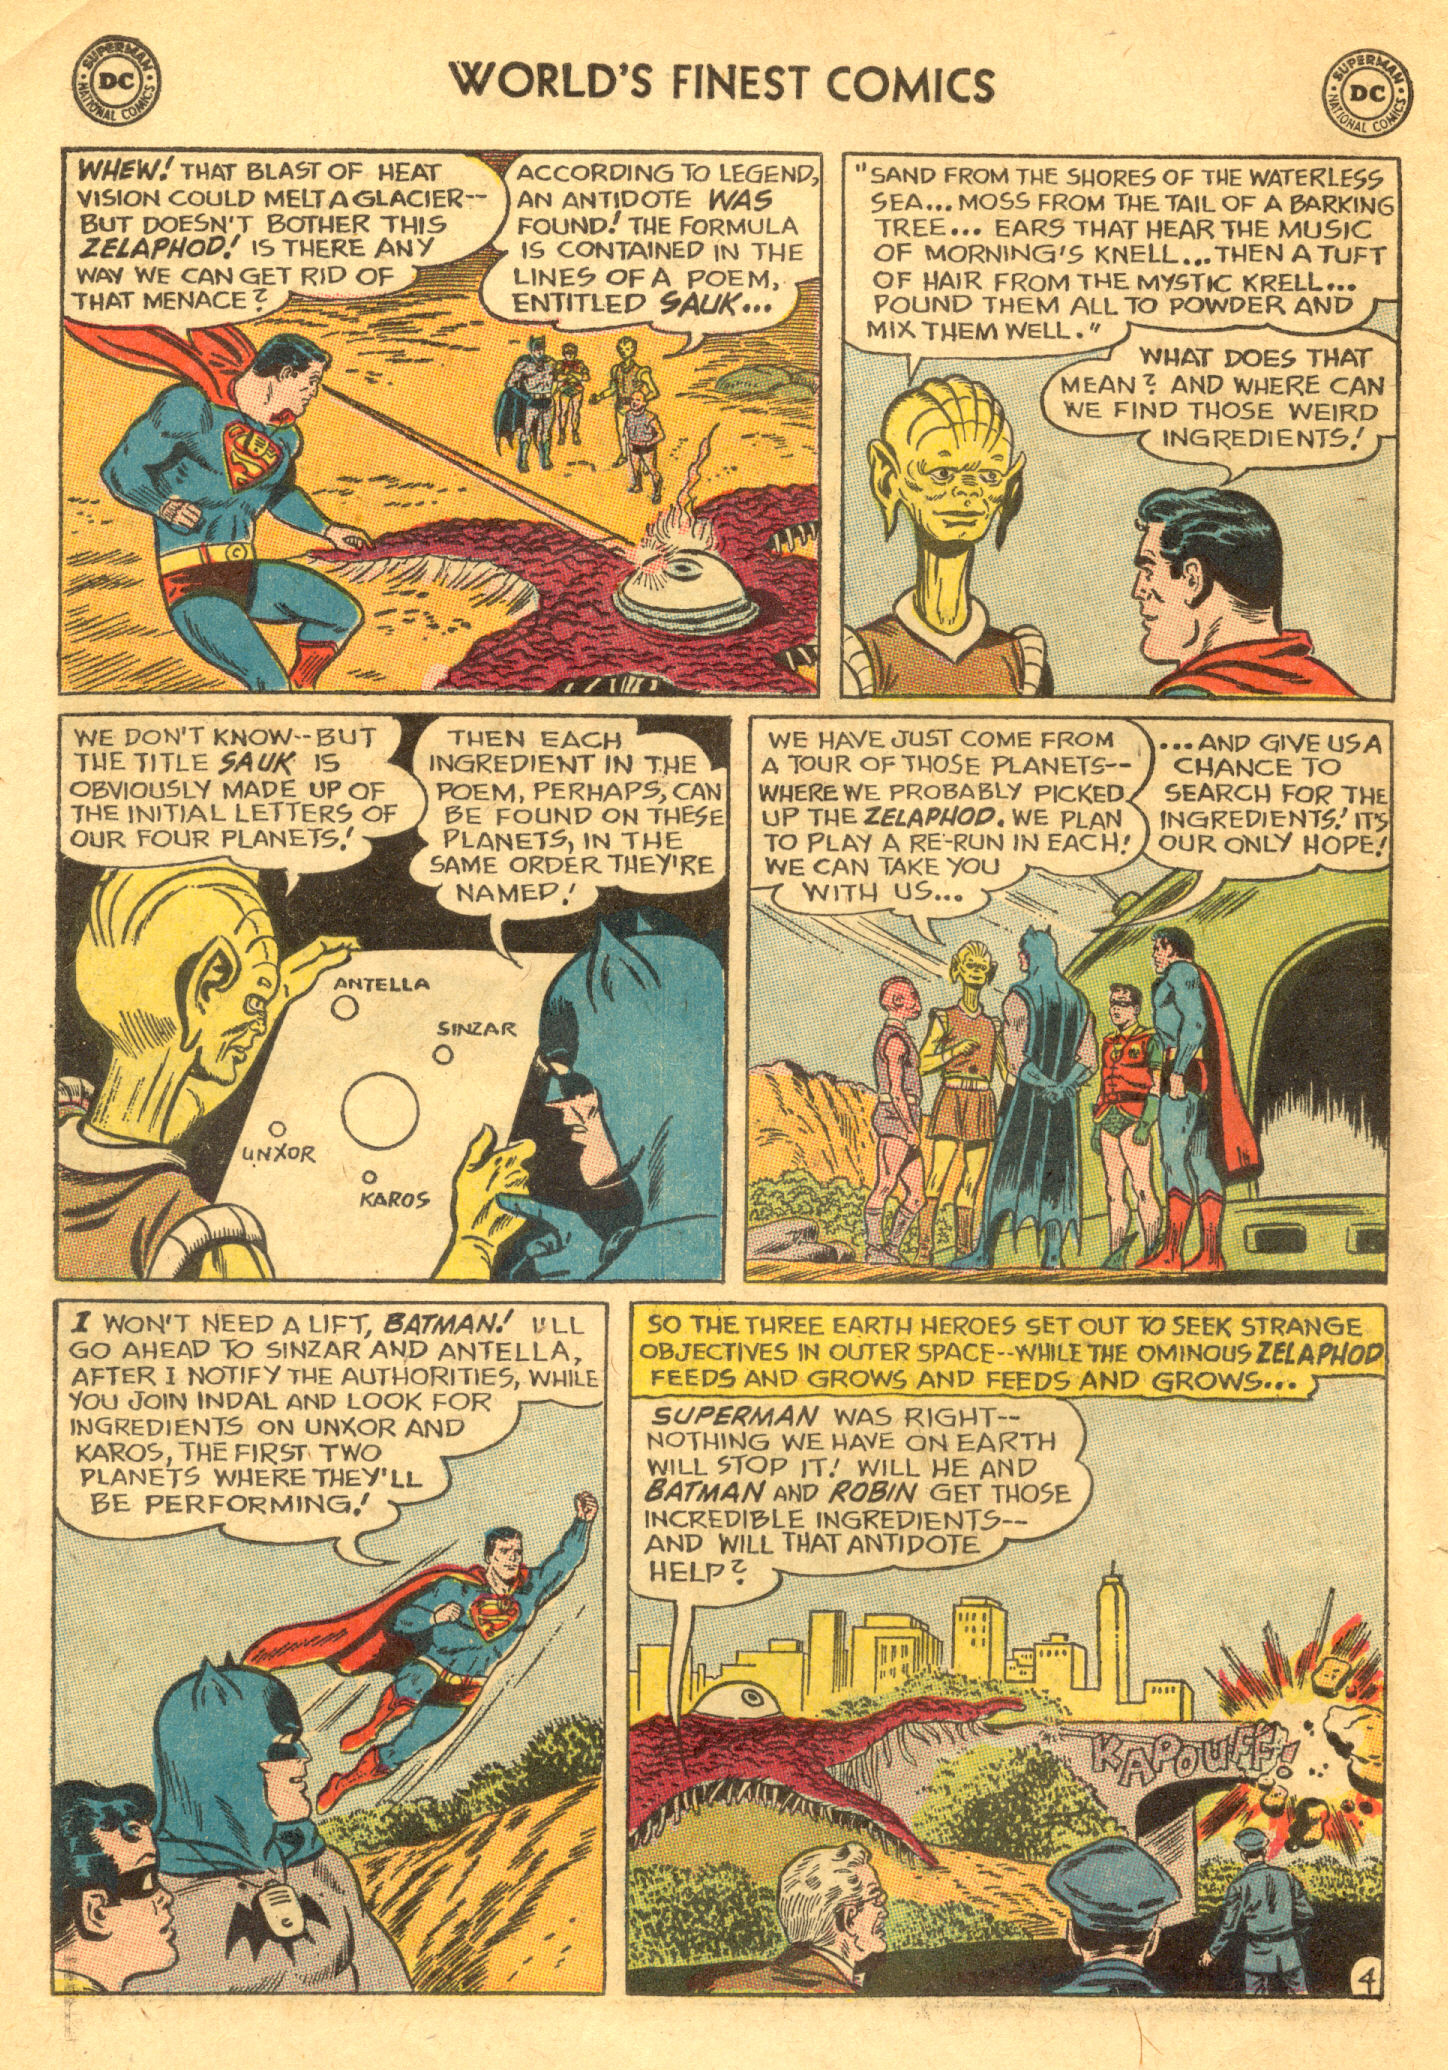 Read online World's Finest Comics comic -  Issue #130 - 6